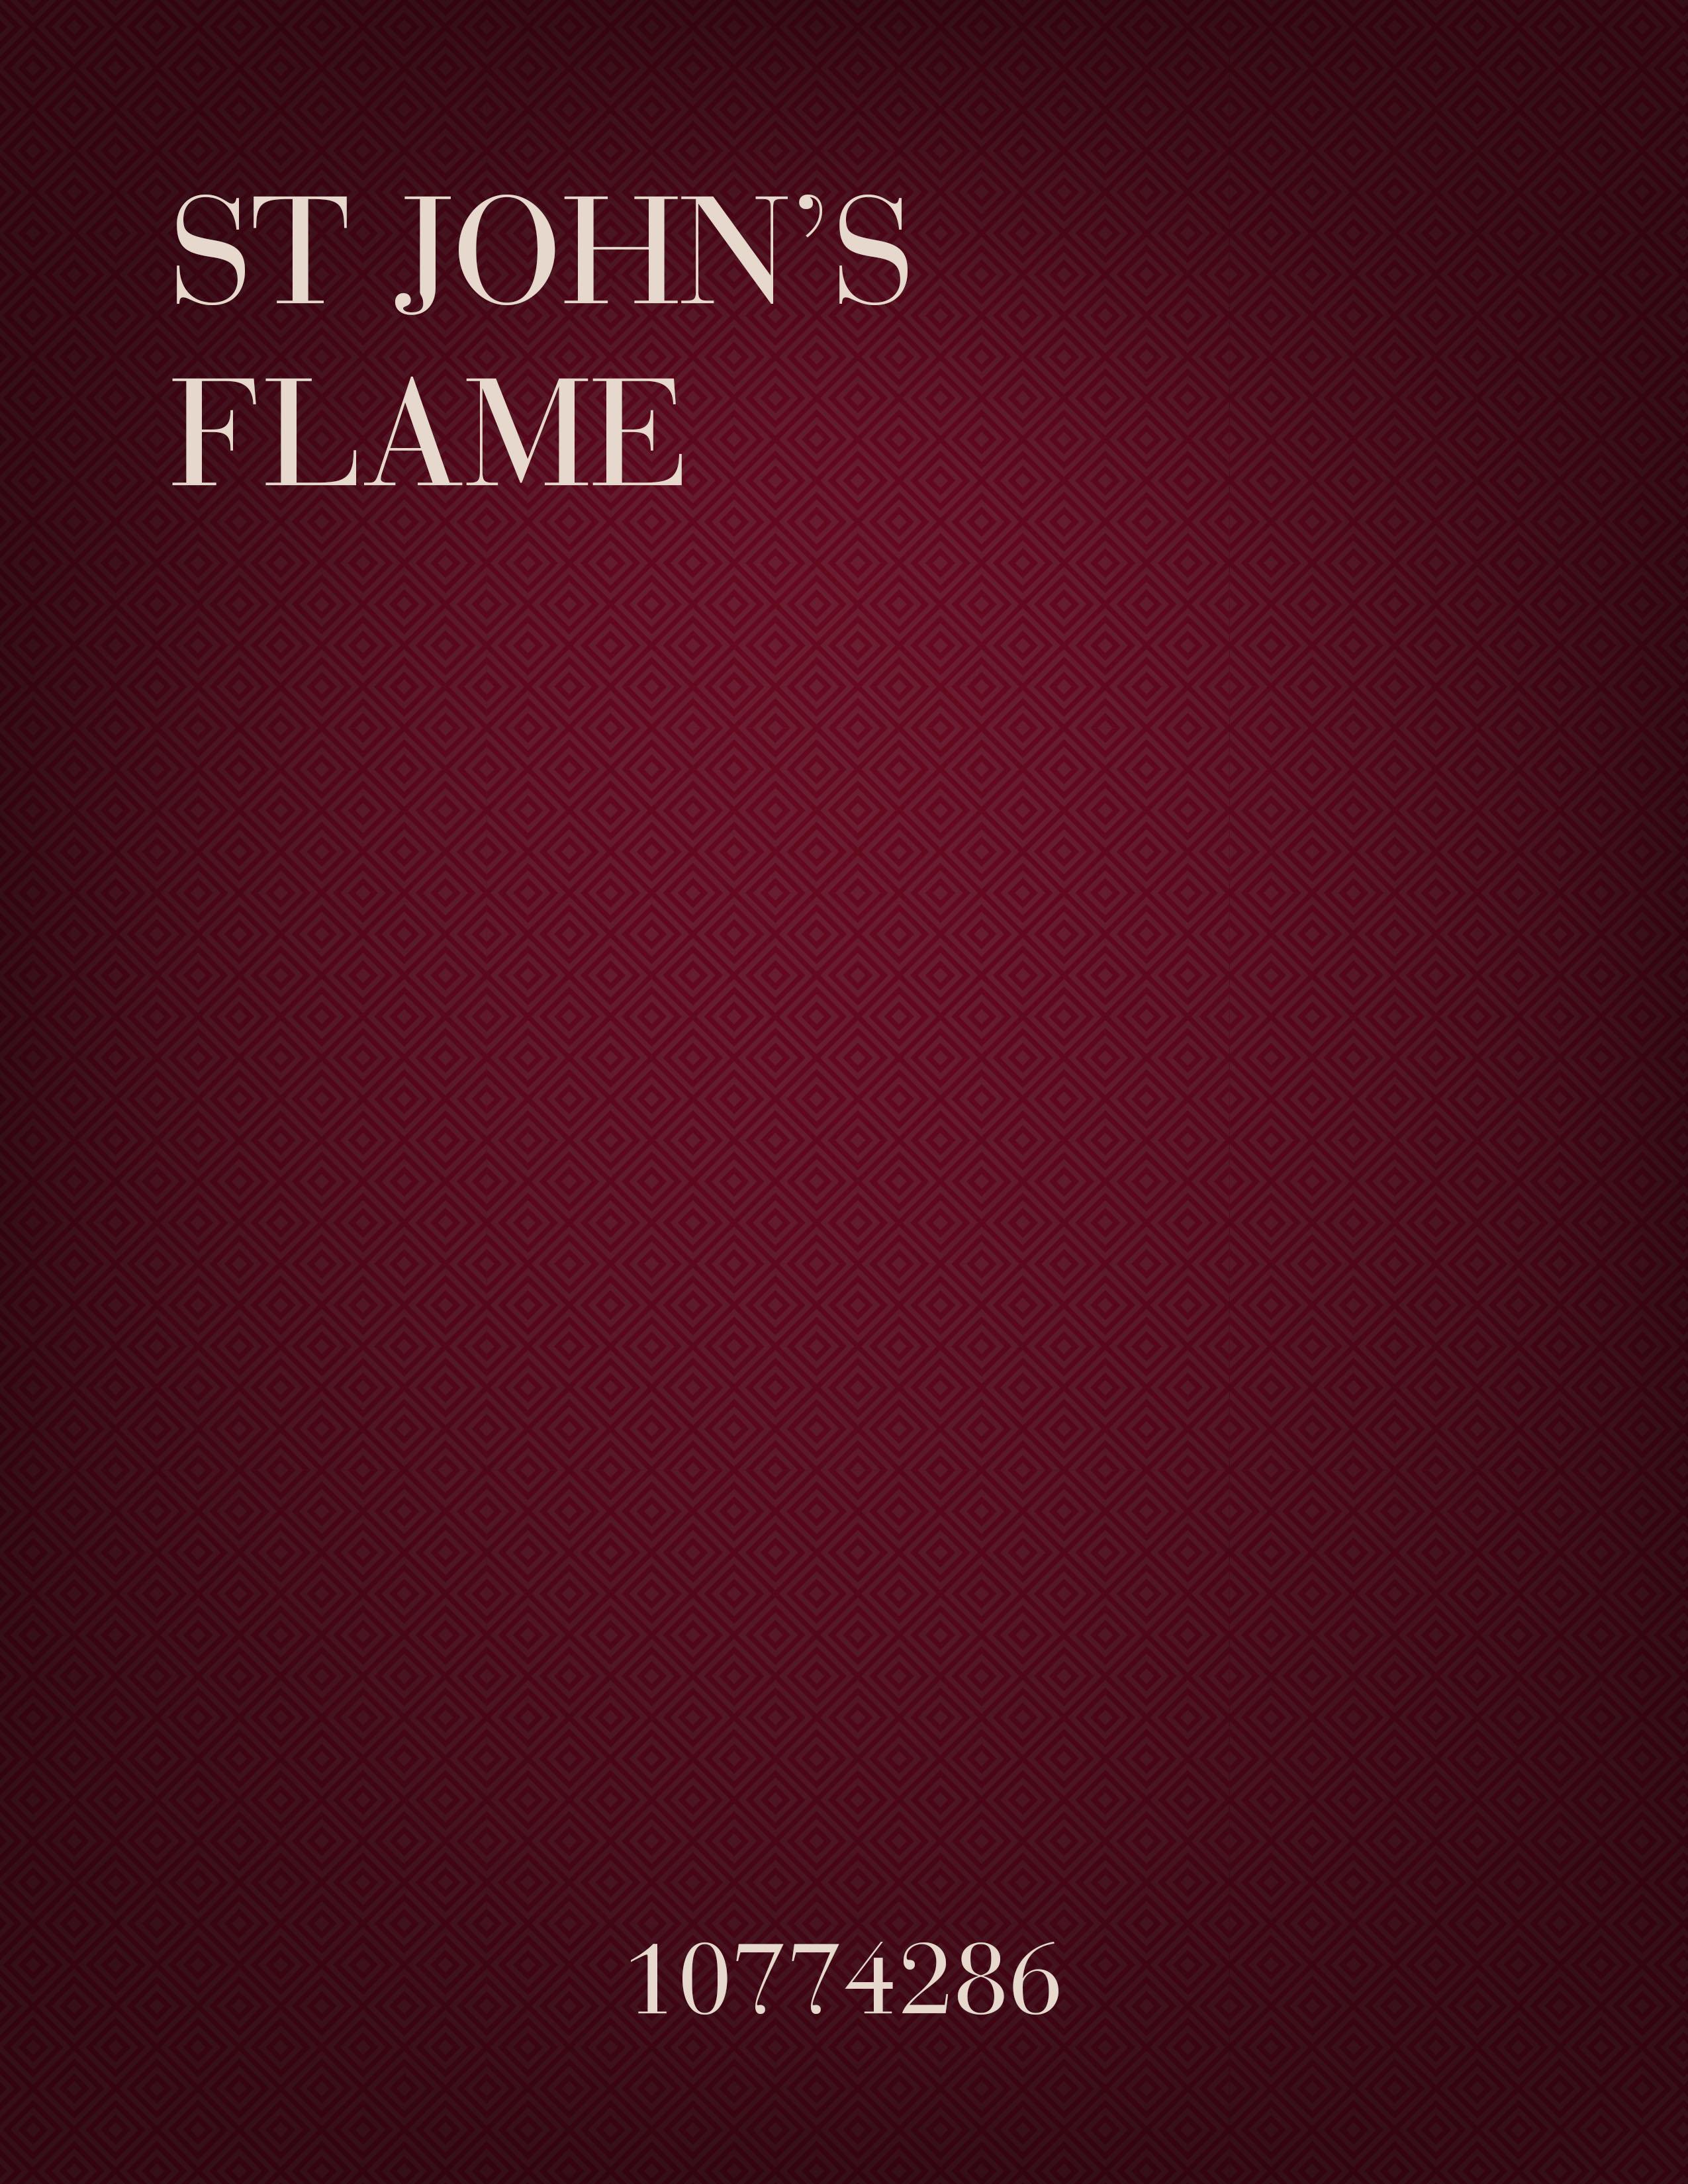 St. John's Flame